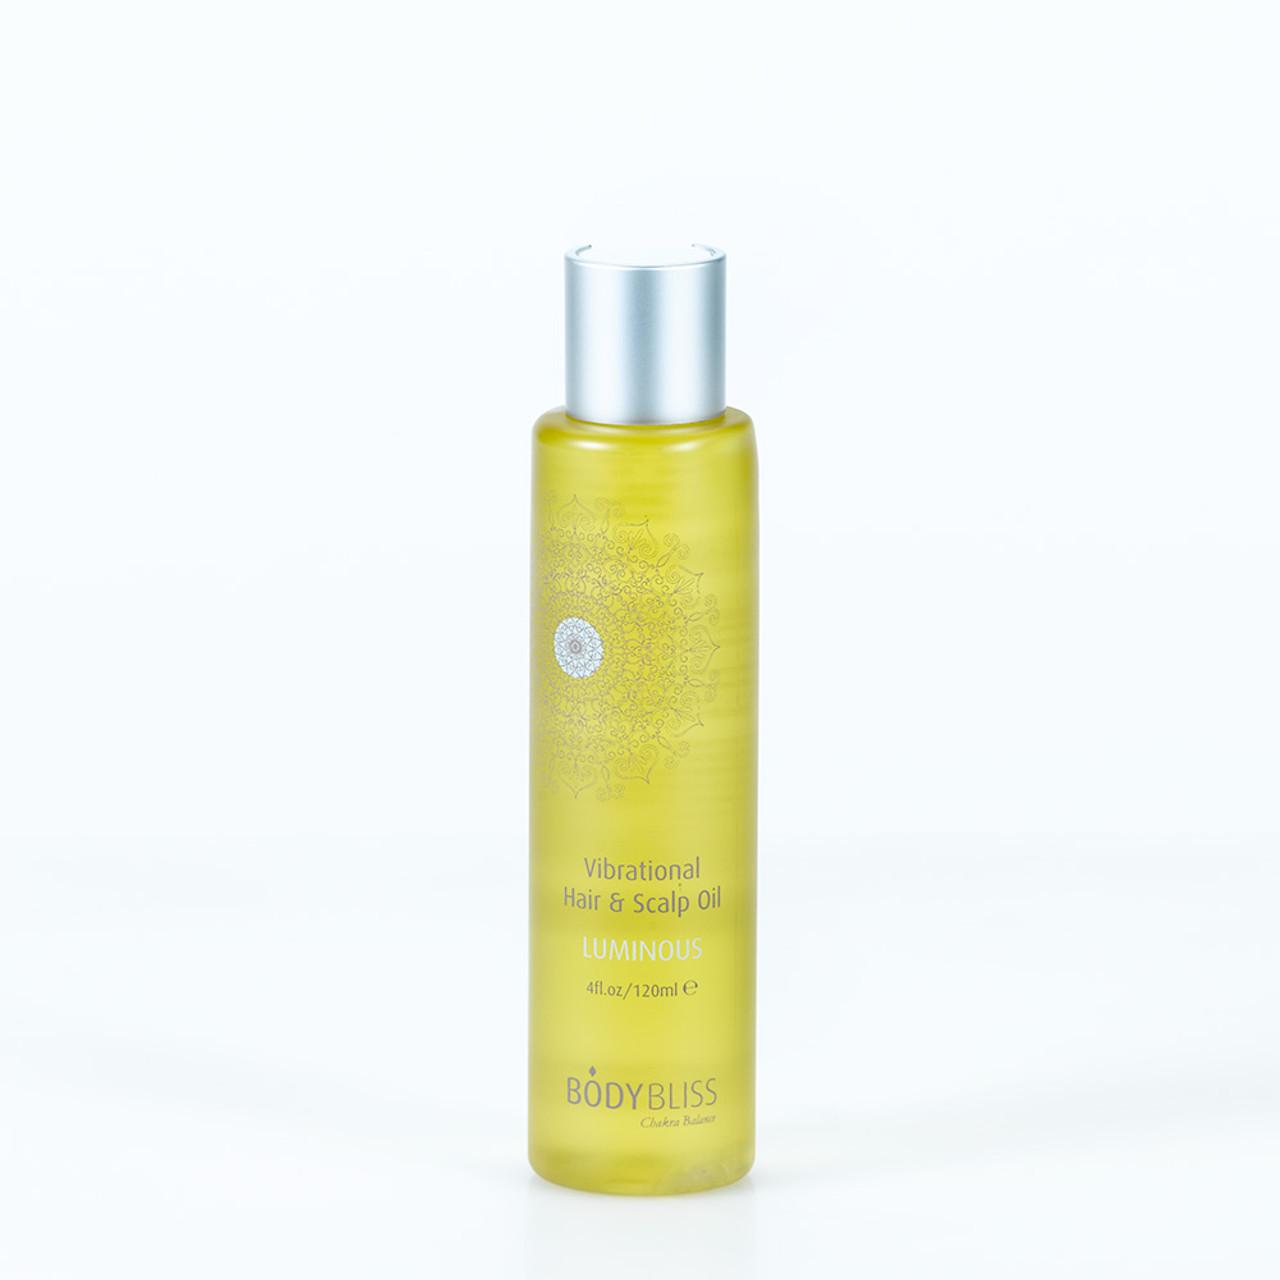 LUMINOUS Vibrational Hair & Scalp Oil